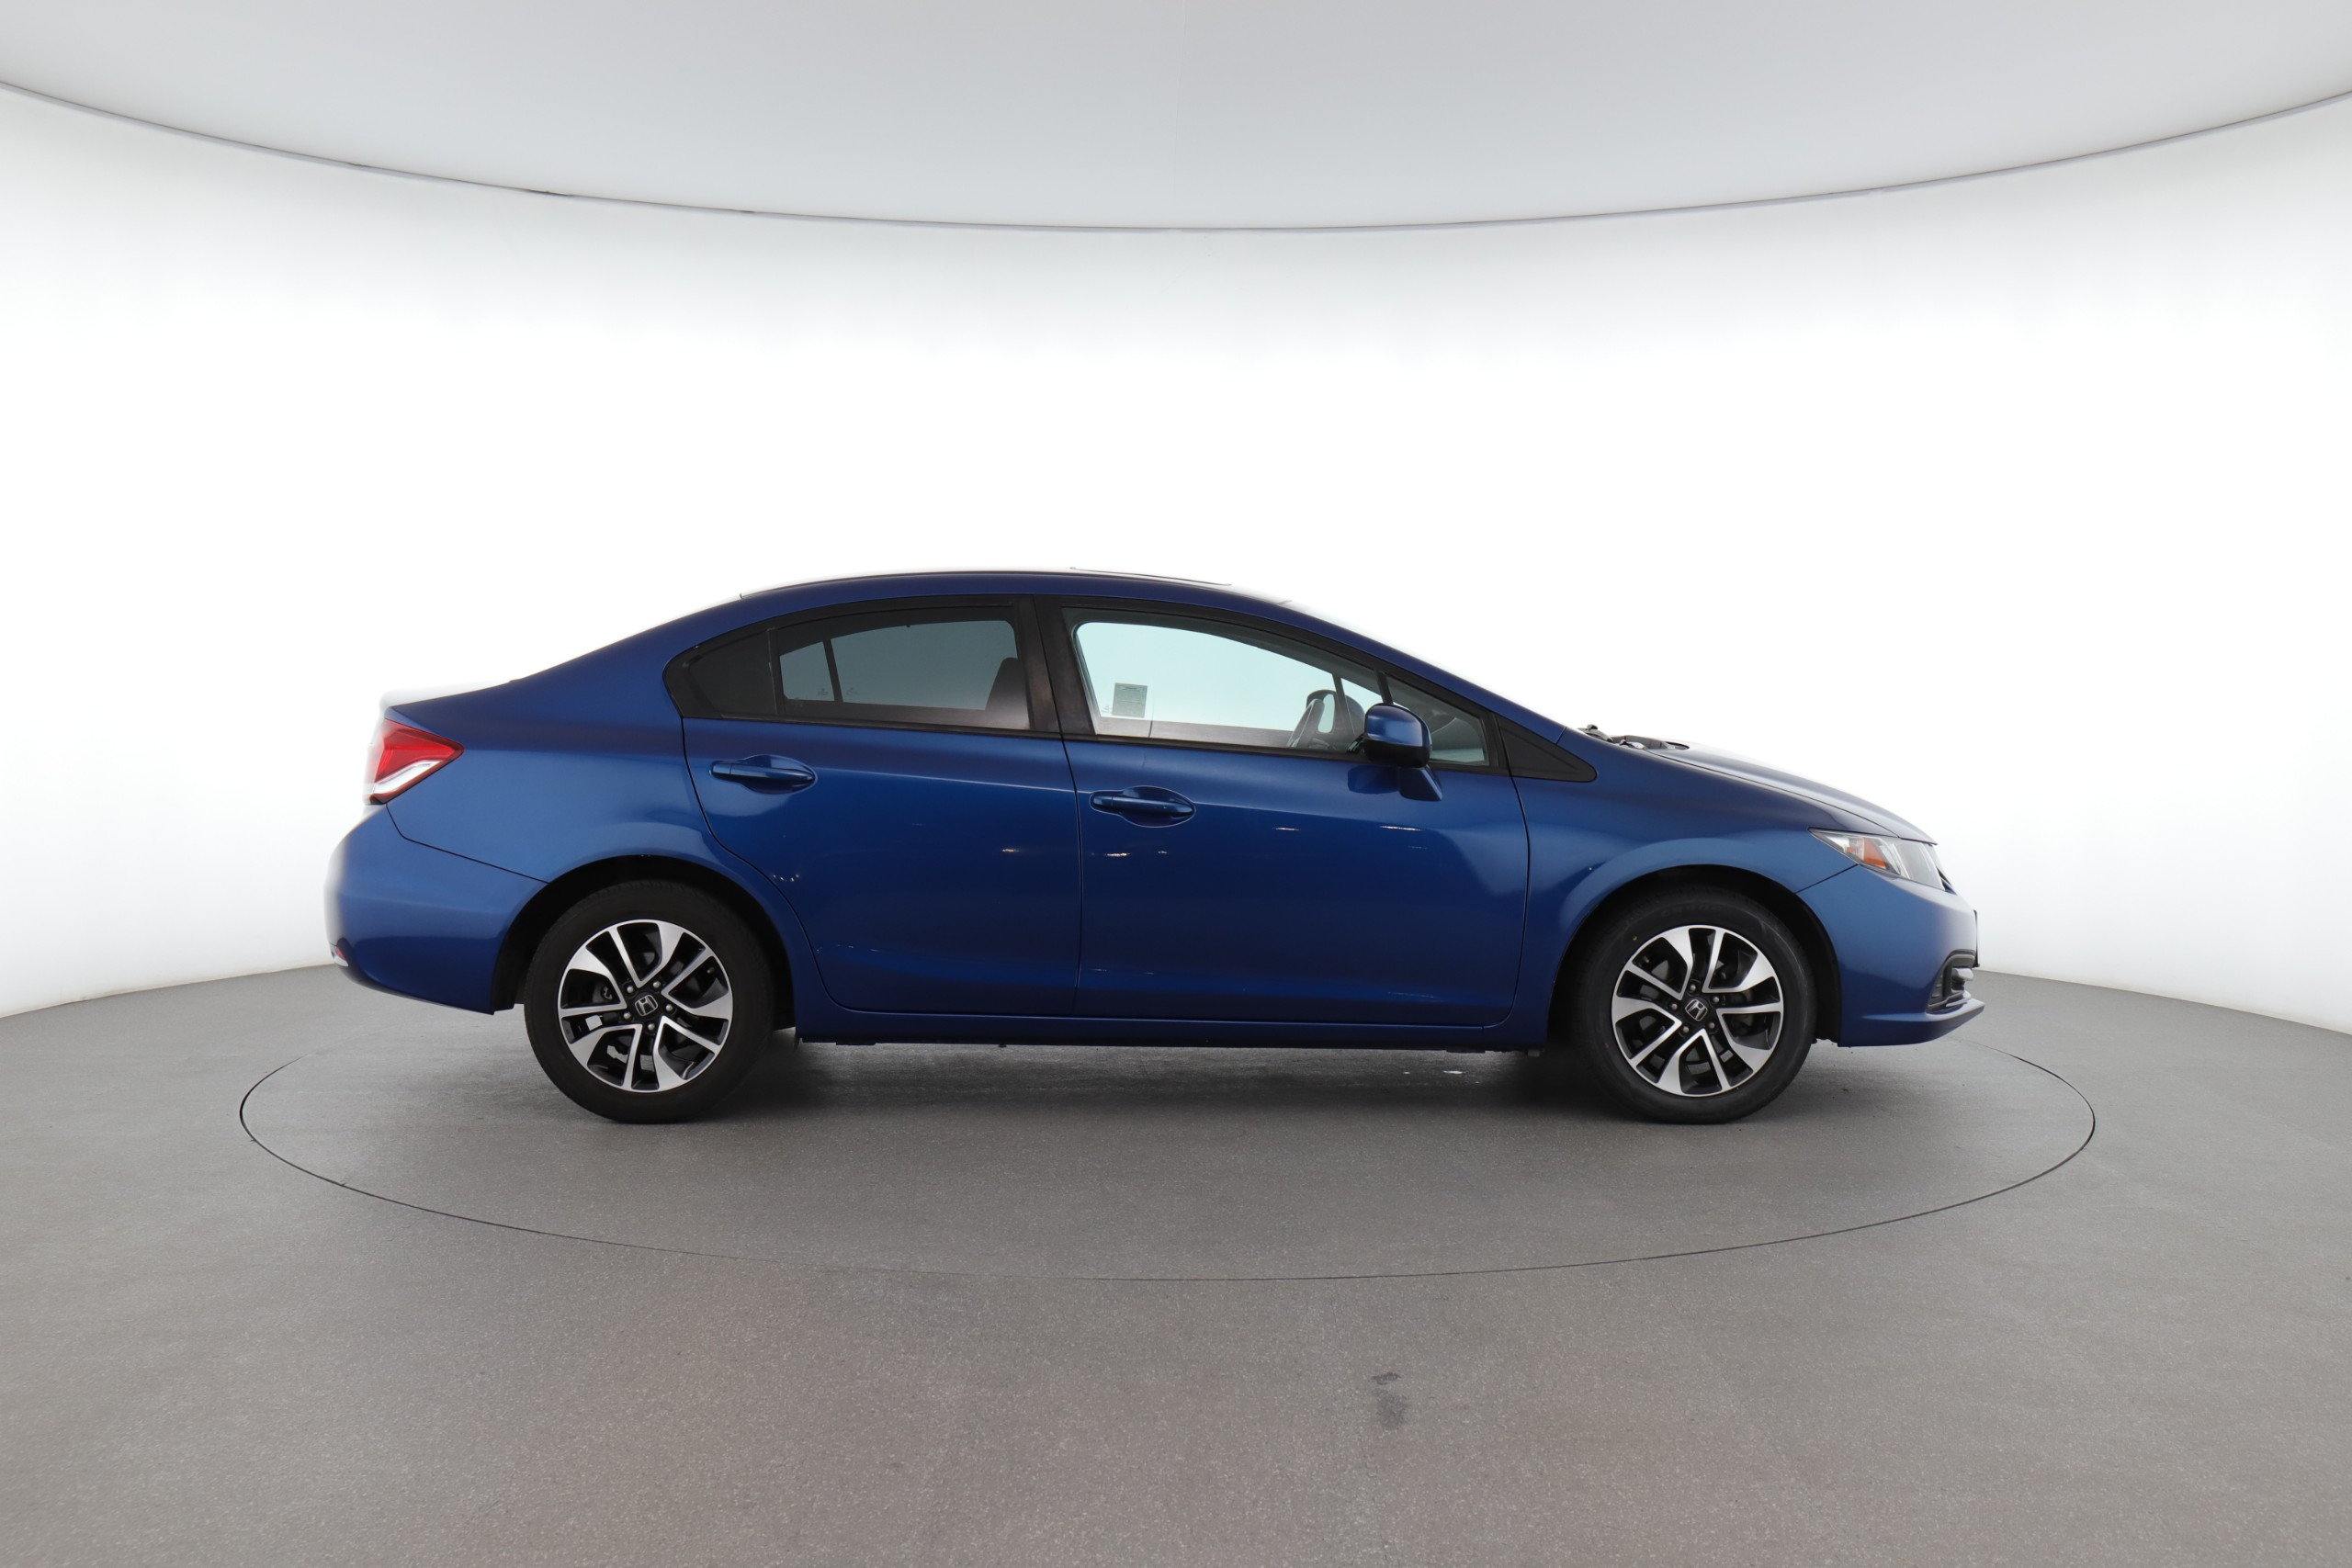 Honda Civic vs Accord: Comparing Two All-Star Sedans